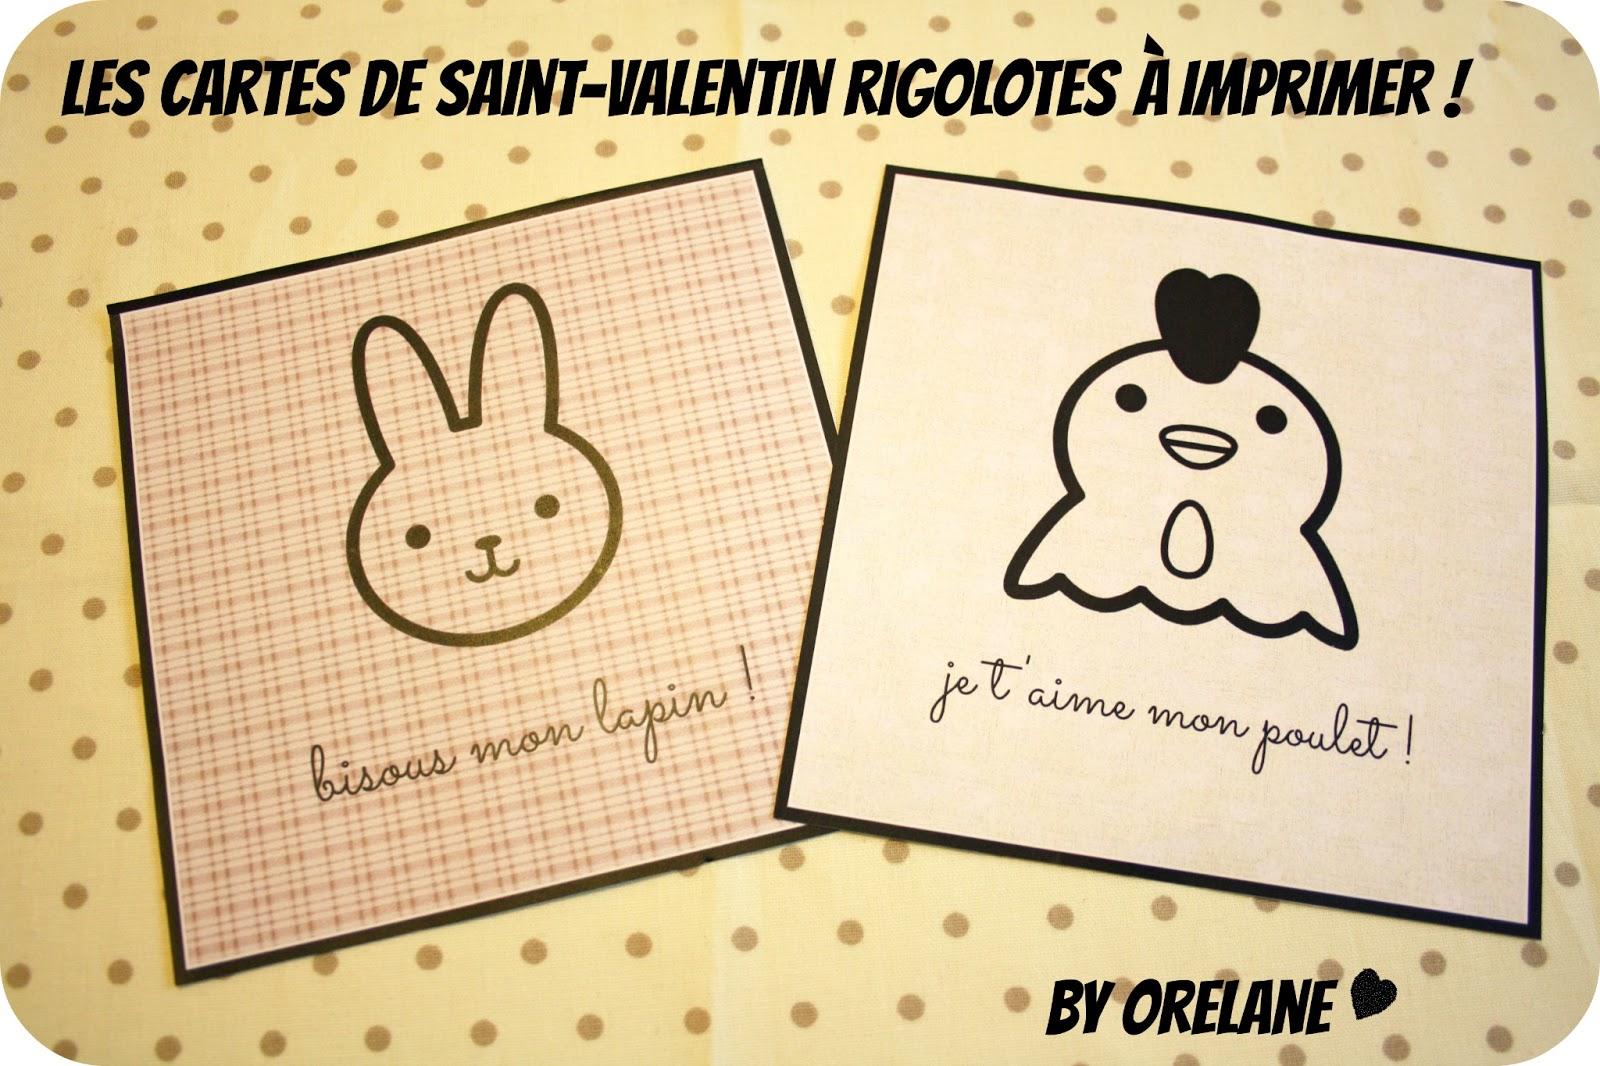 orelane a imprimer les cartes rigolotes de saint valentin. Black Bedroom Furniture Sets. Home Design Ideas